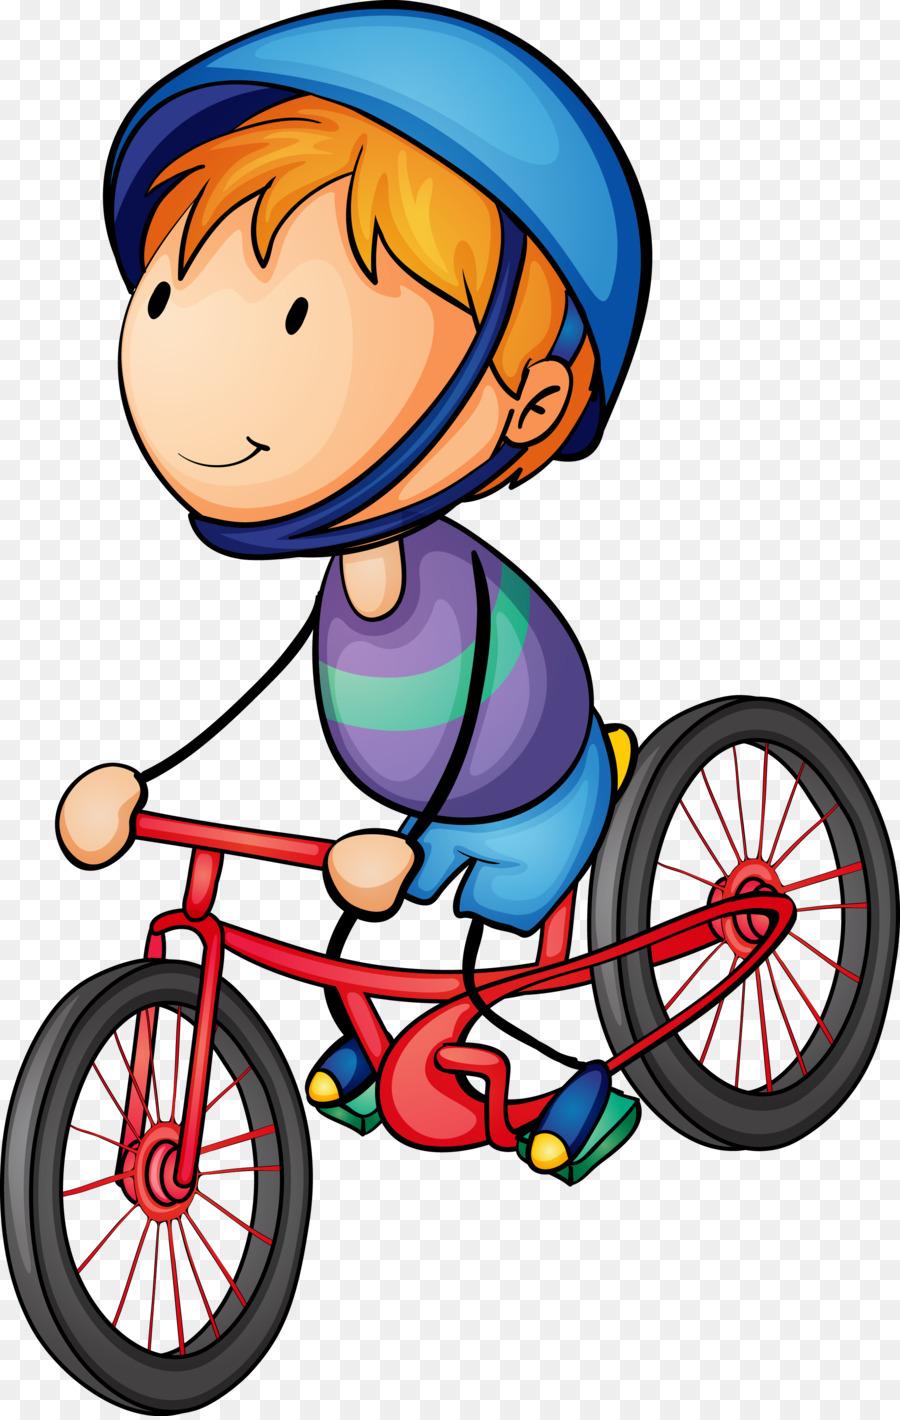 Fahrrad Rad Royalty free clipart.